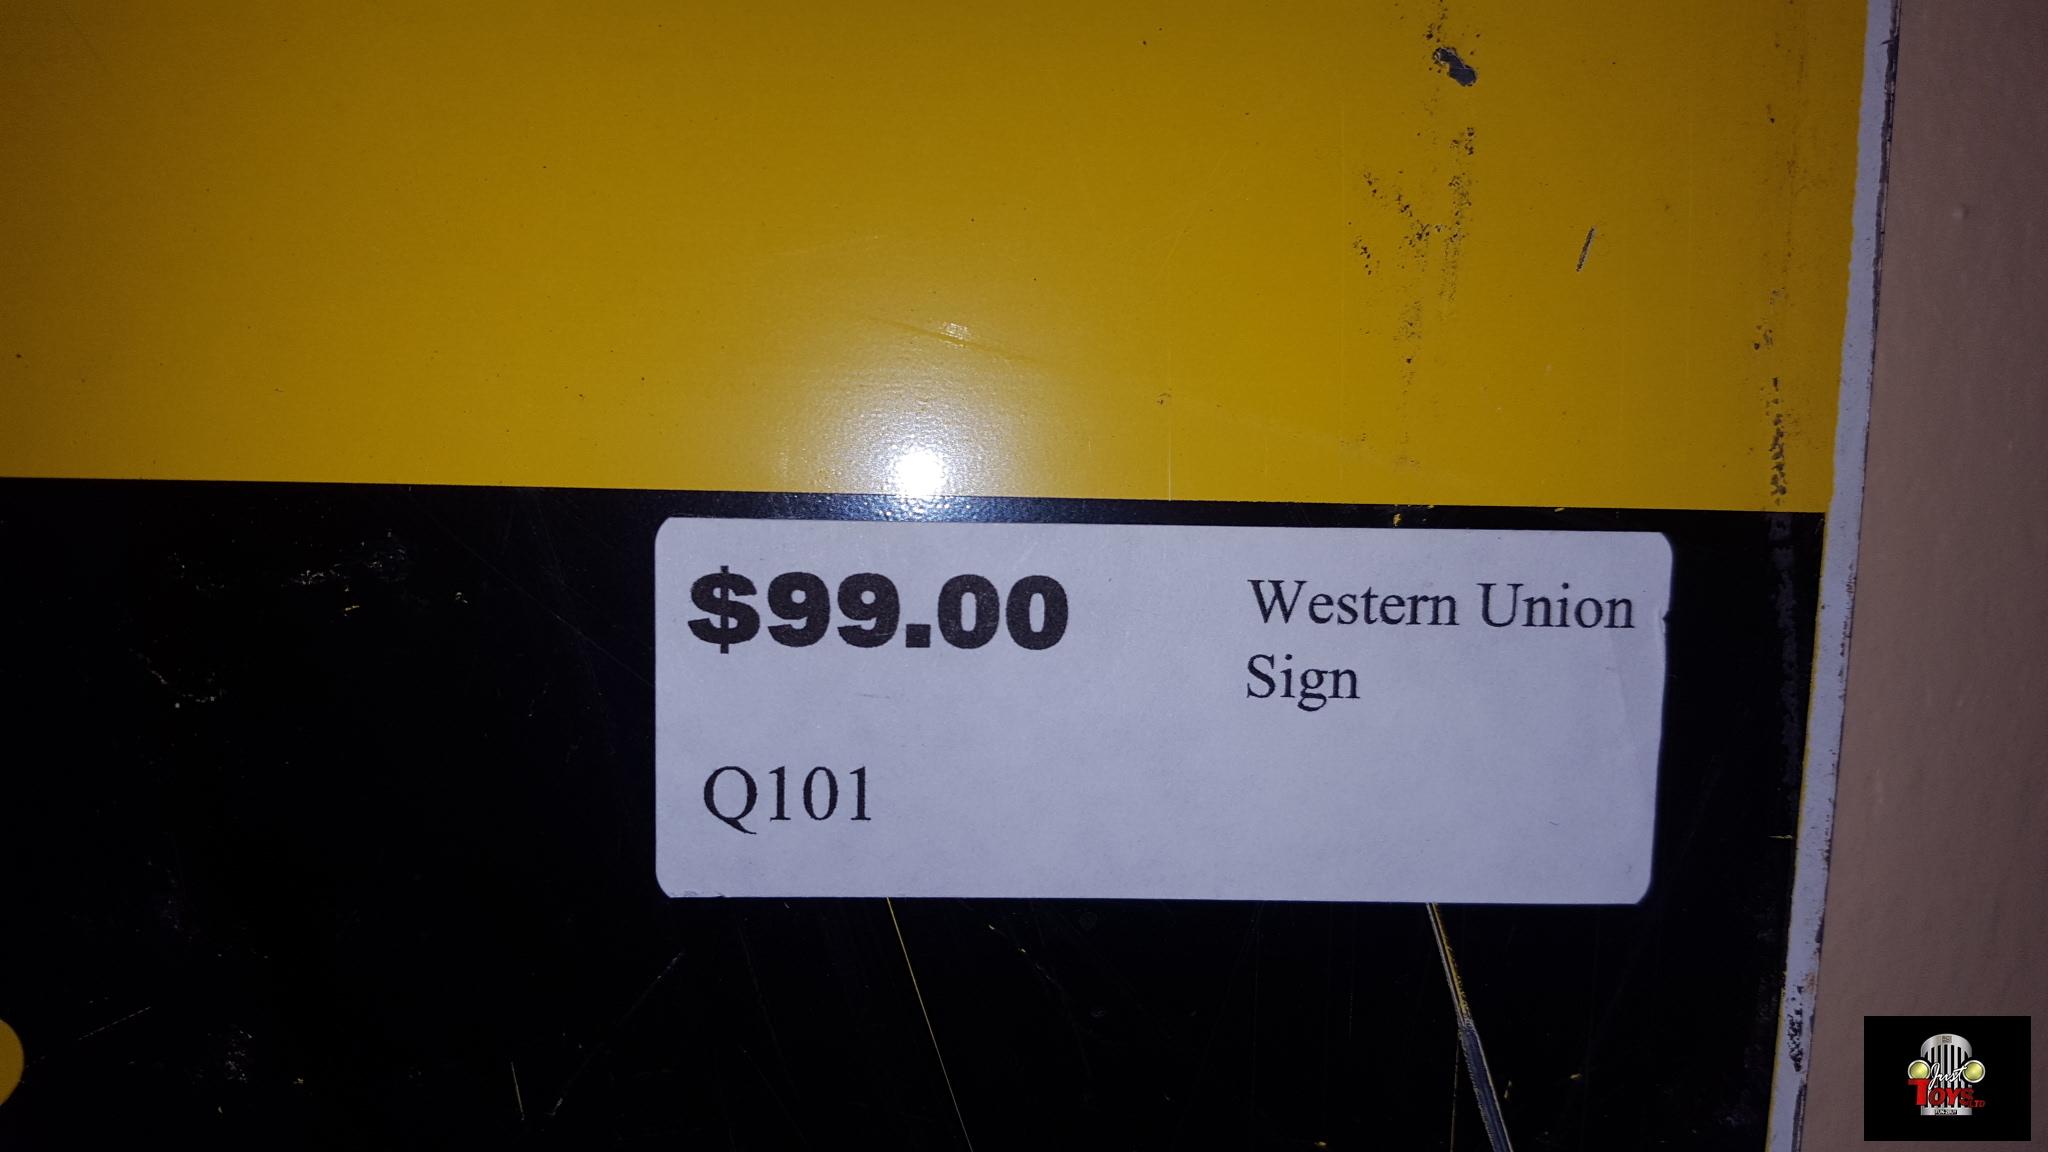 Western Union Sign